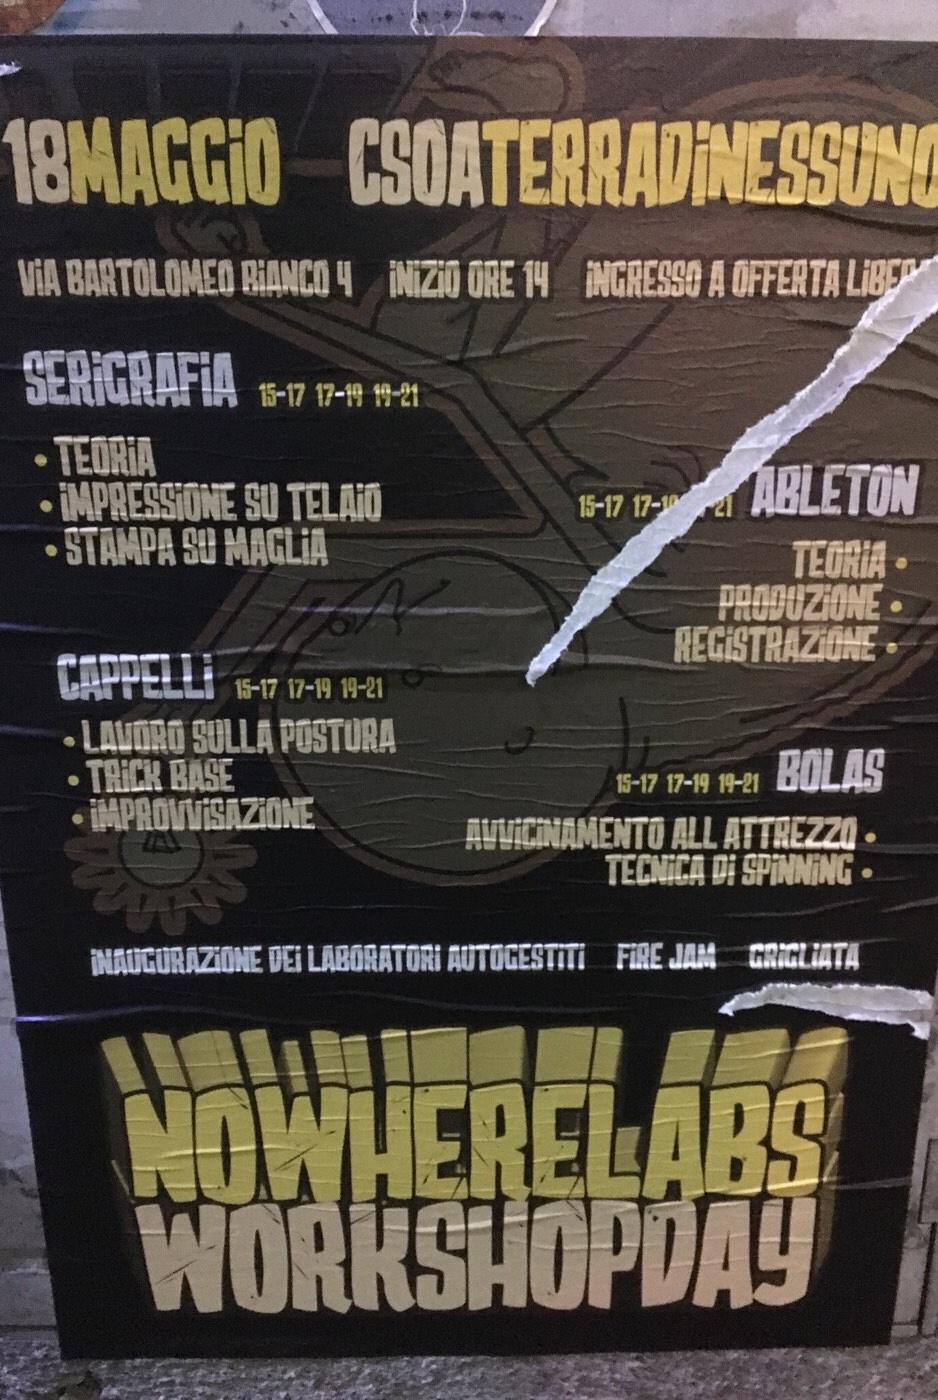 Nowherelabs LSOA Buridda Corso Monte Grappa 39, 16137 Genova Dal 18/05/2018 Al 18/05/2018 15:00 - 21:00